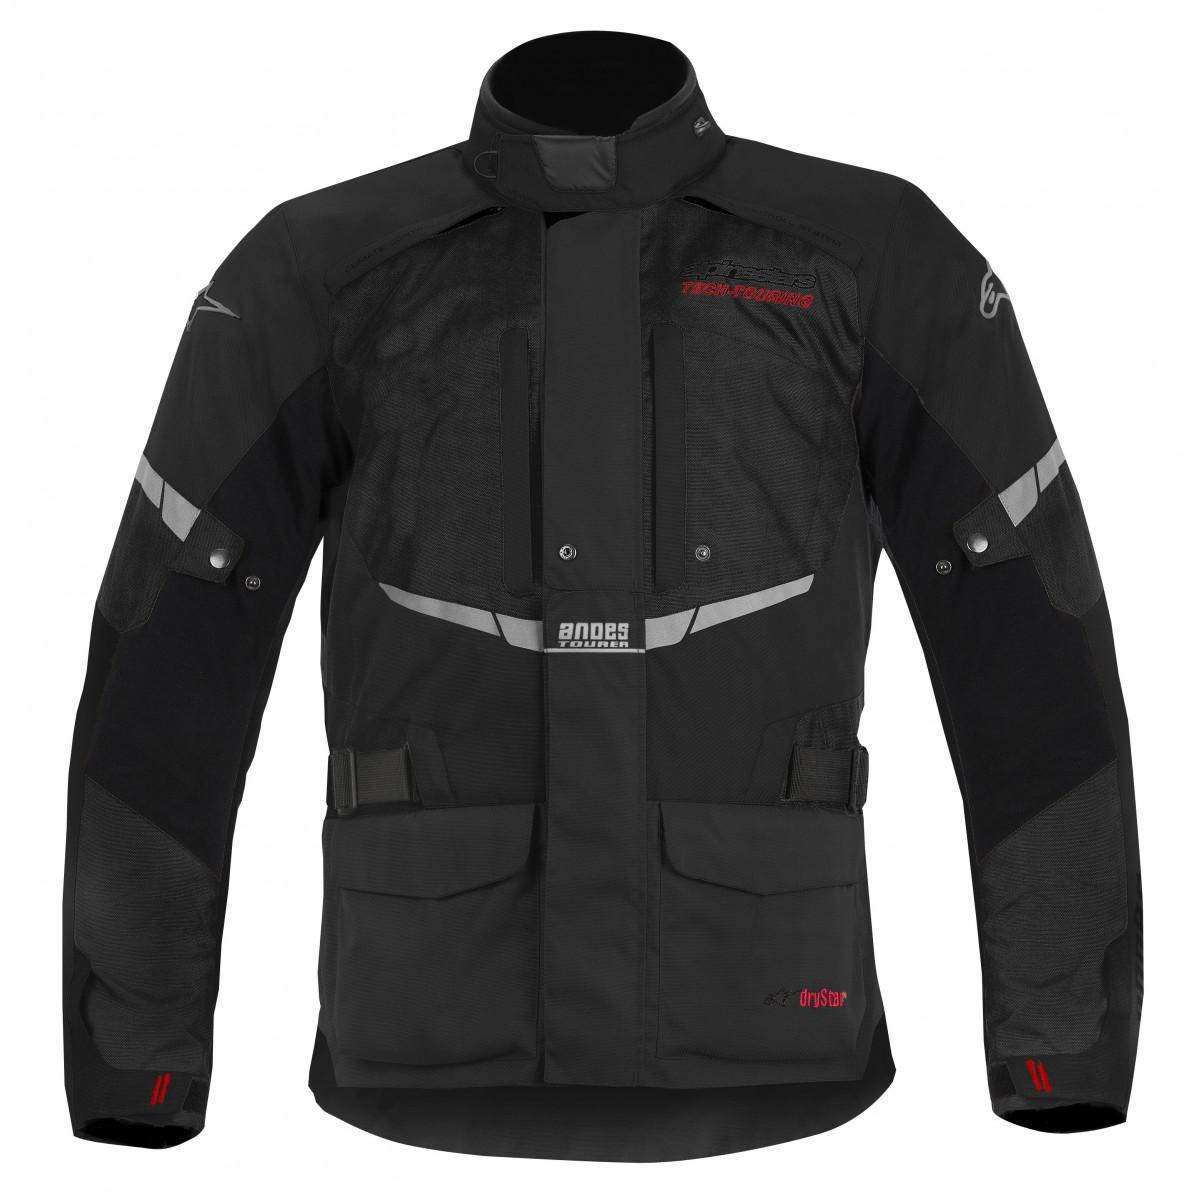 Jaqueta Alpinestars Andes Drystar® Preta Impermeável - Só 2XL  - Super Bike - Loja Oficial Alpinestars